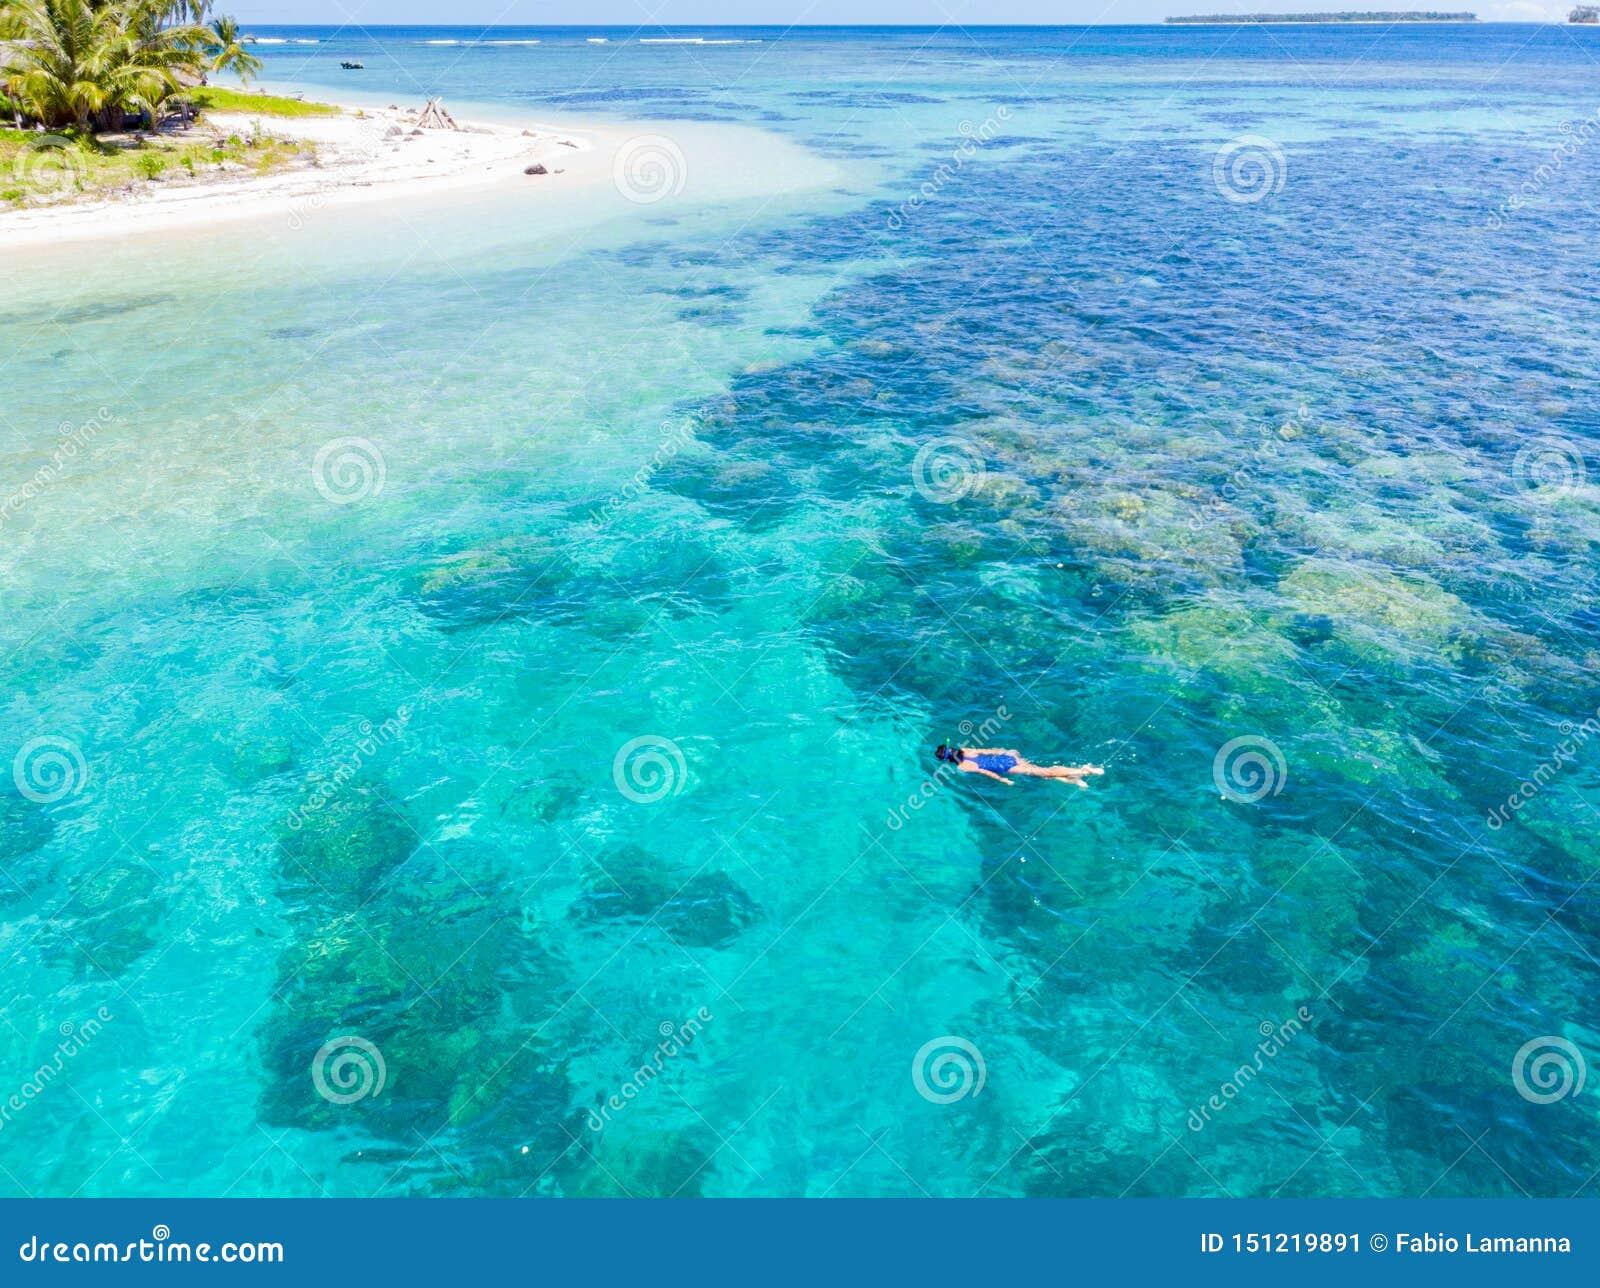 Aerial top down people snorkeling on coral reef tropical caribbean sea, turquoise blue water. Indonesia Banyak Islands Sumatra,